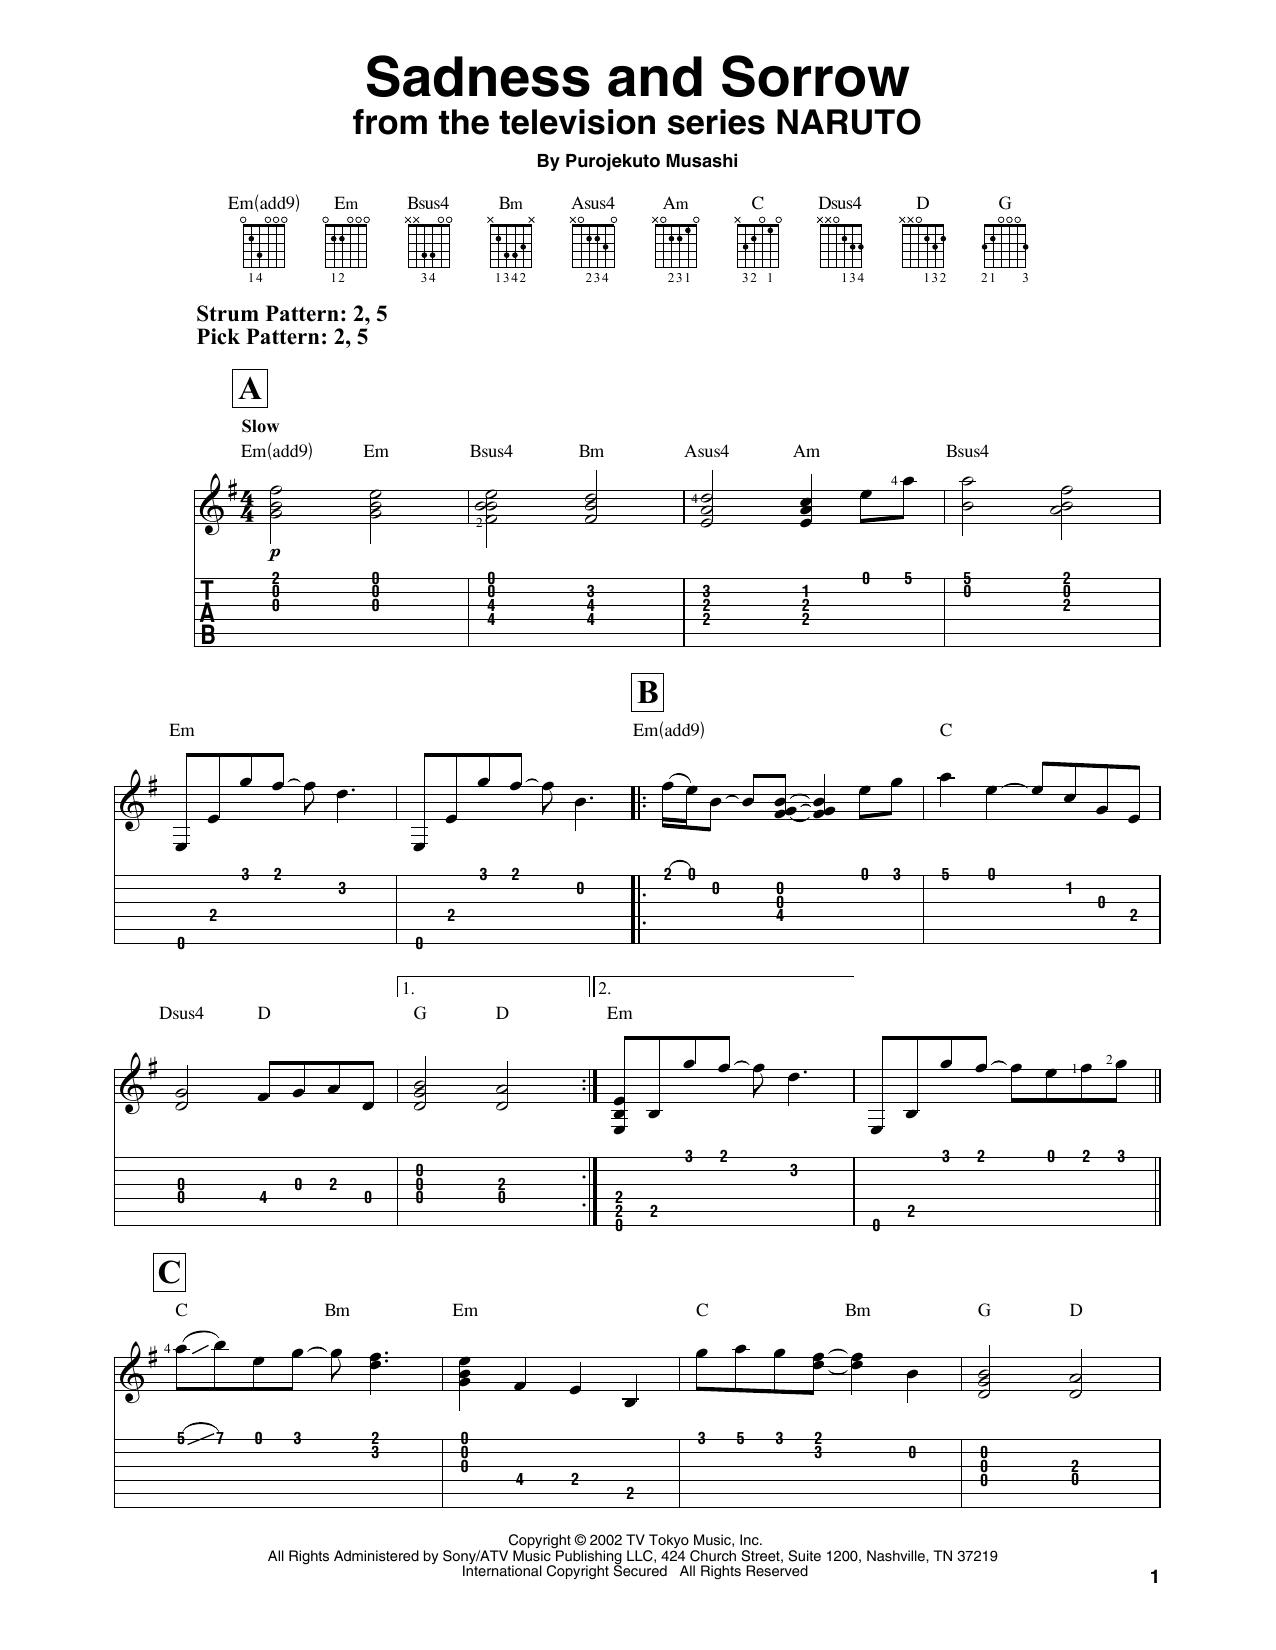 Purojekuto Musashi Sadness And Sorrow From Naruto Sheet Music Pdf Notes Chords Japanese Score Easy Guitar Tab Download Printable Sku 433145